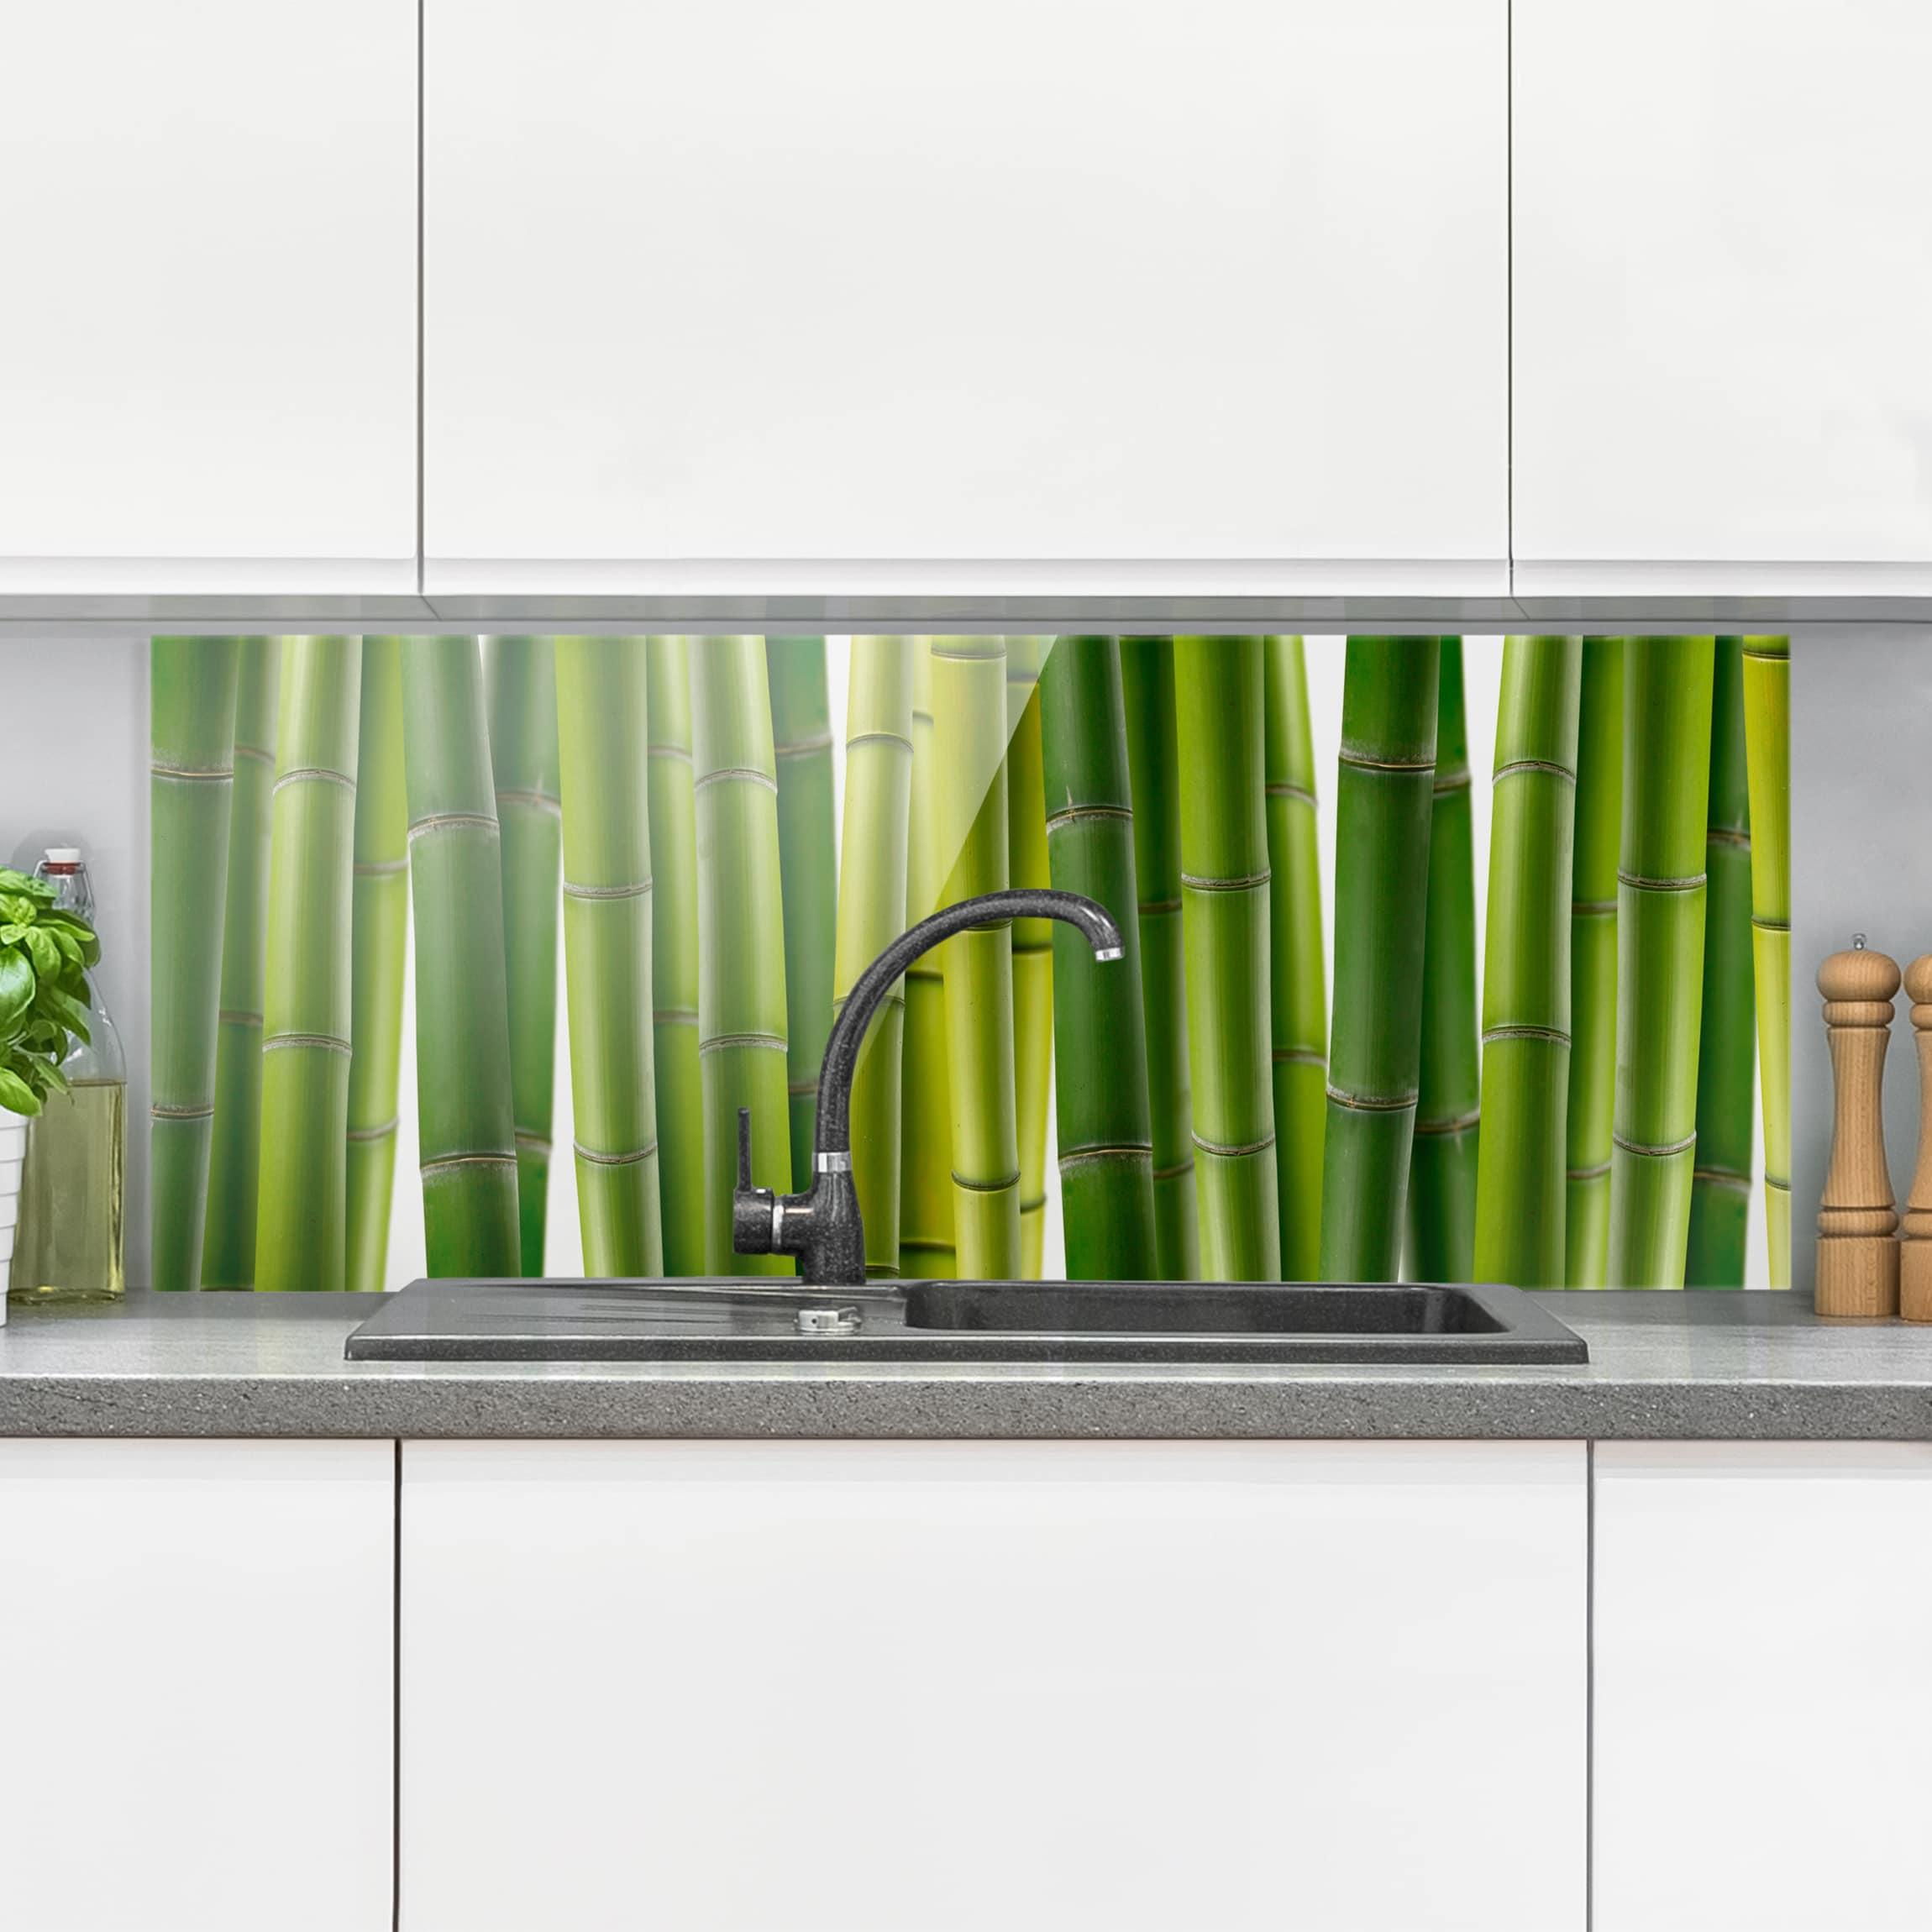 Spritzschutz glas bambuspflanzen panorama quer for Spritzschutz glas